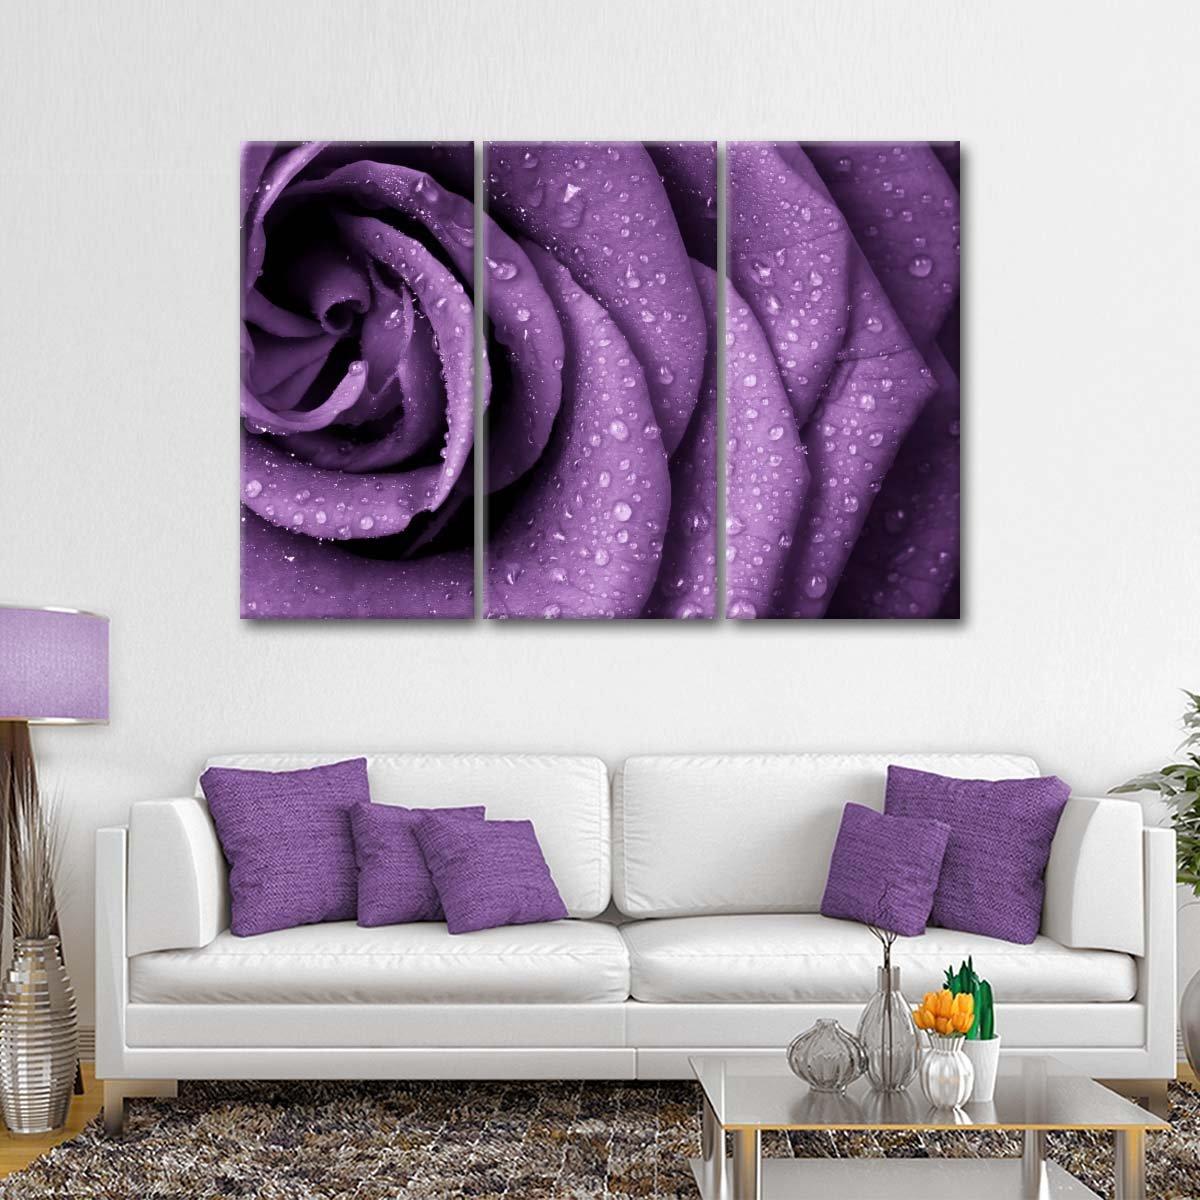 Radiant Violet Rose Multi Panel Canvas Wall Art